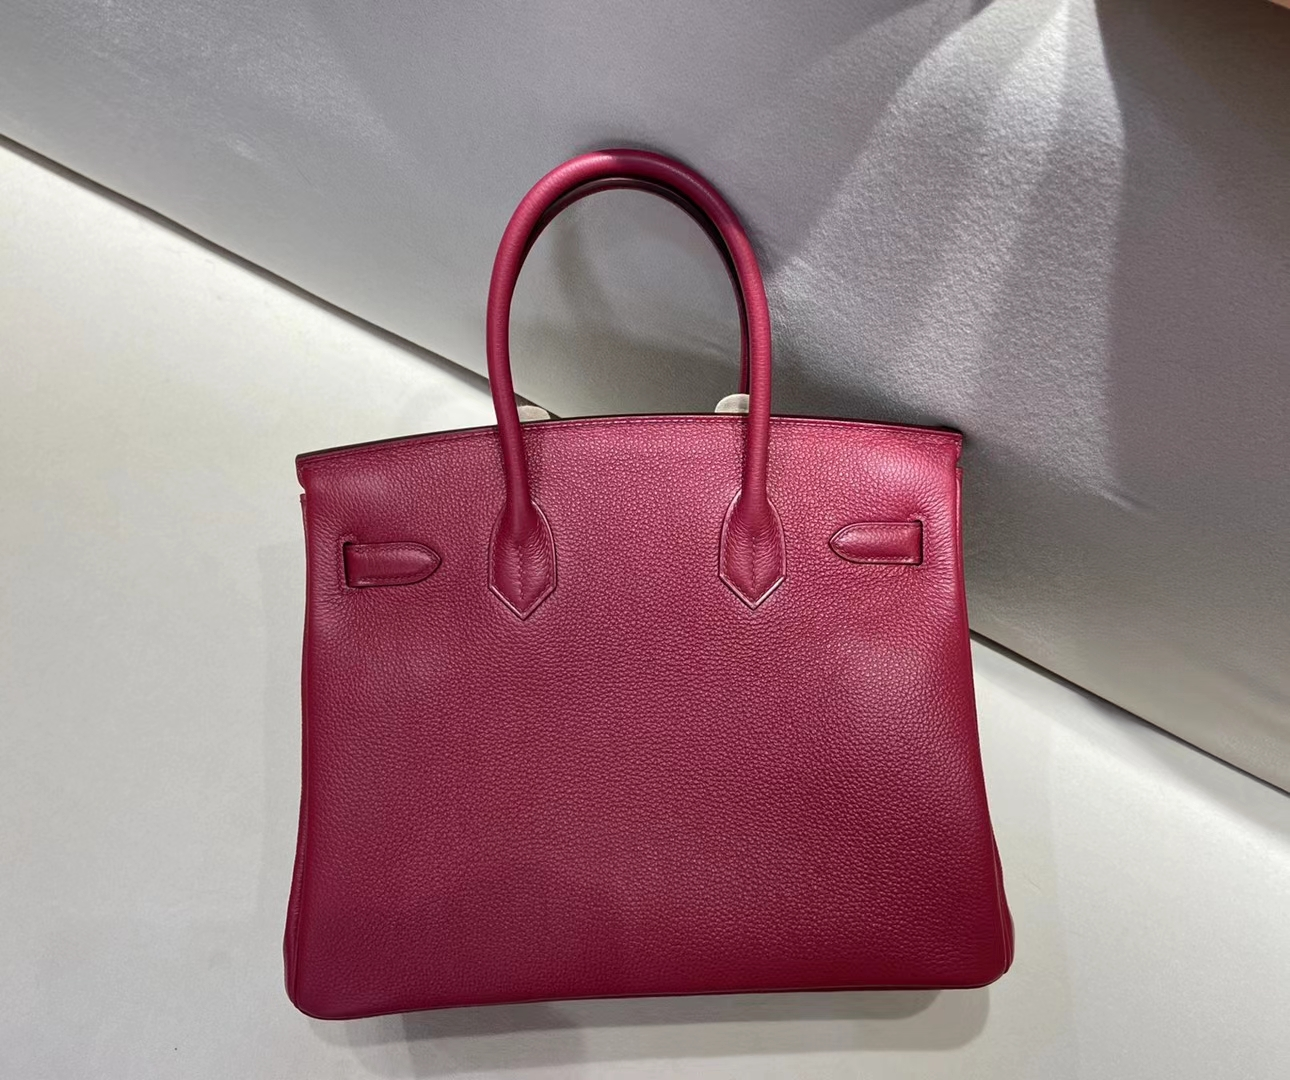 Hermès(爱马仕)birkin 30cm 银扣 法国石榴红 togo 顶级纯手工